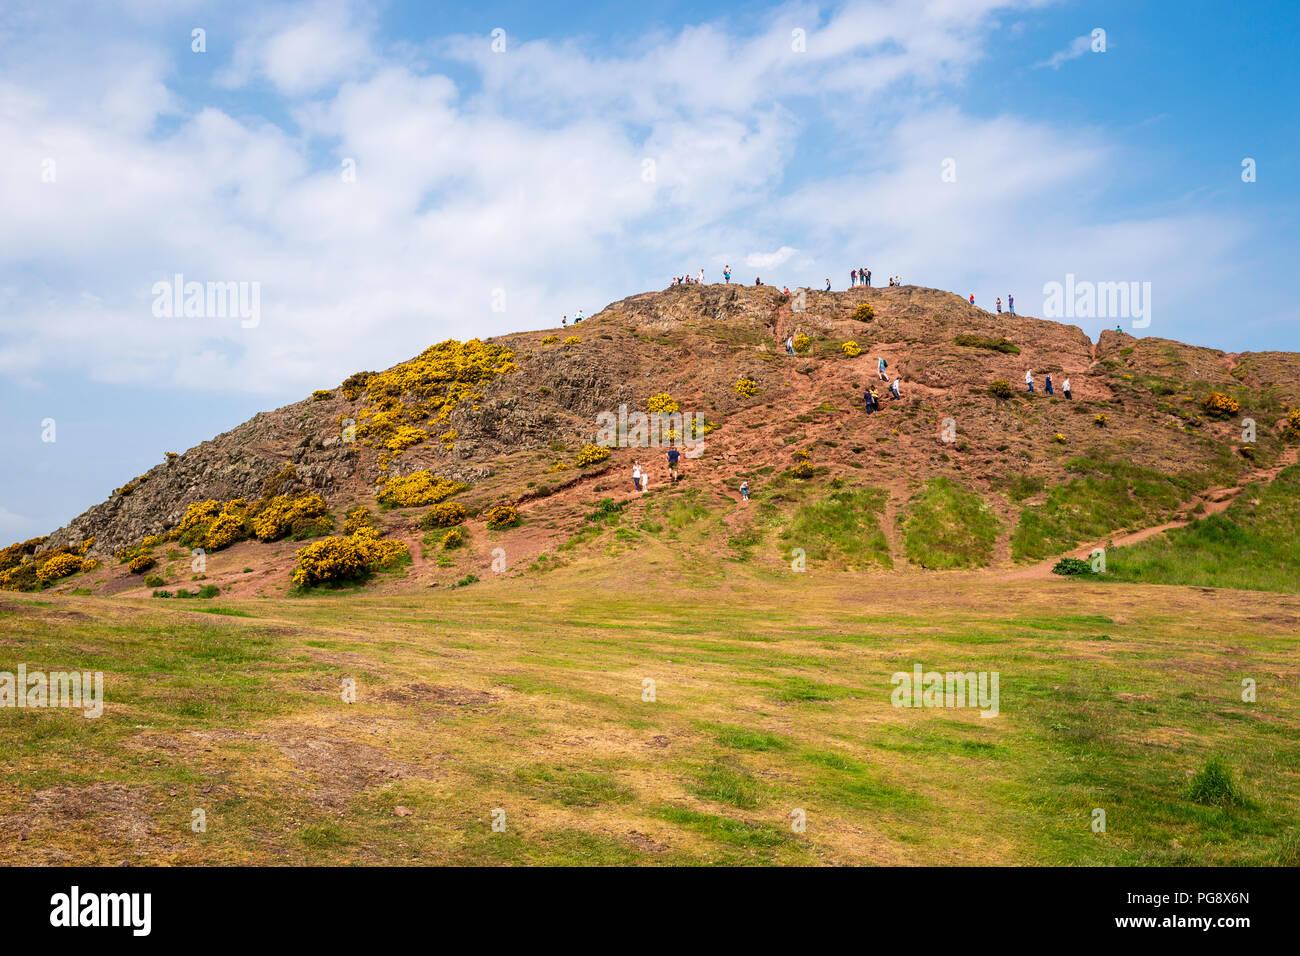 Tourists and walkers enjoy the summit of Arthur's Seat in Holyrood Park, Edinburgh, Scotland, UK. - Stock Image